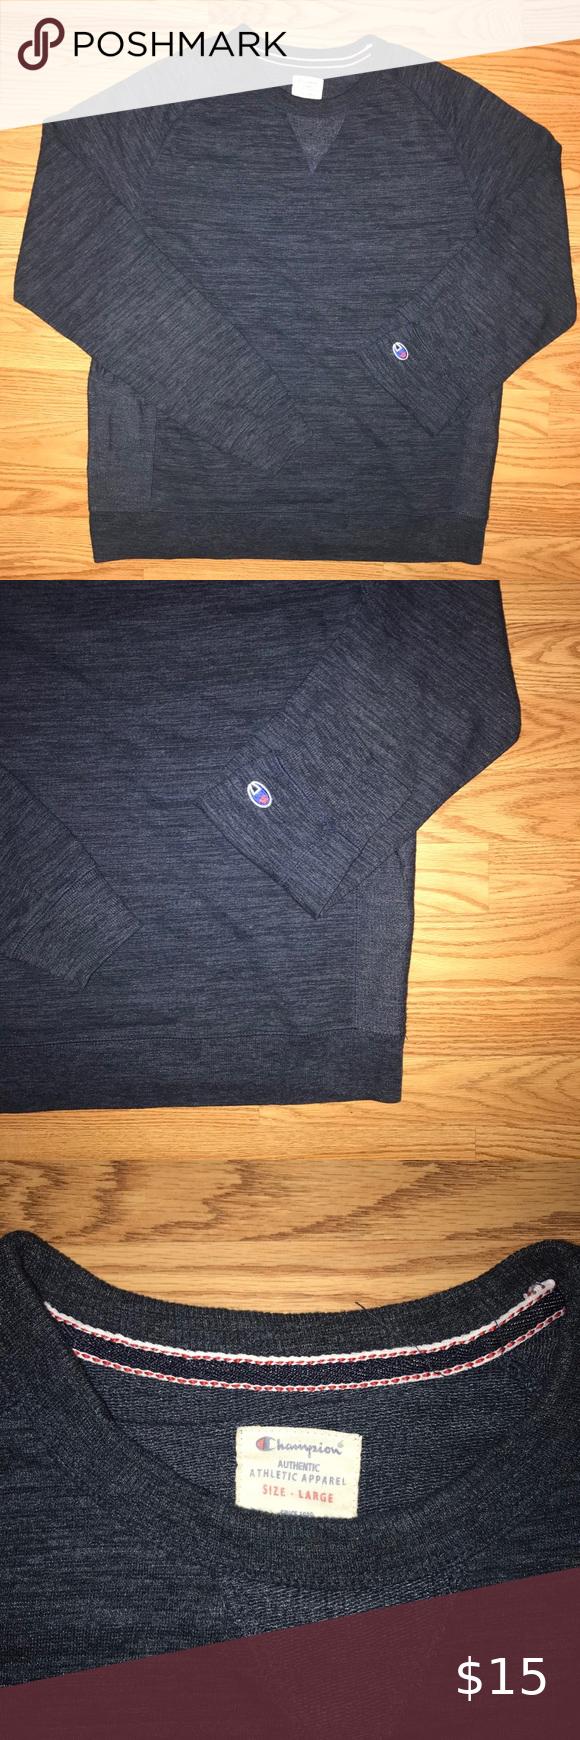 Men S Champion Sweatshirt Champion Sweatshirt Tommy Hilfiger Dress Shirt Mens Champion Sweatshirt [ 1740 x 580 Pixel ]